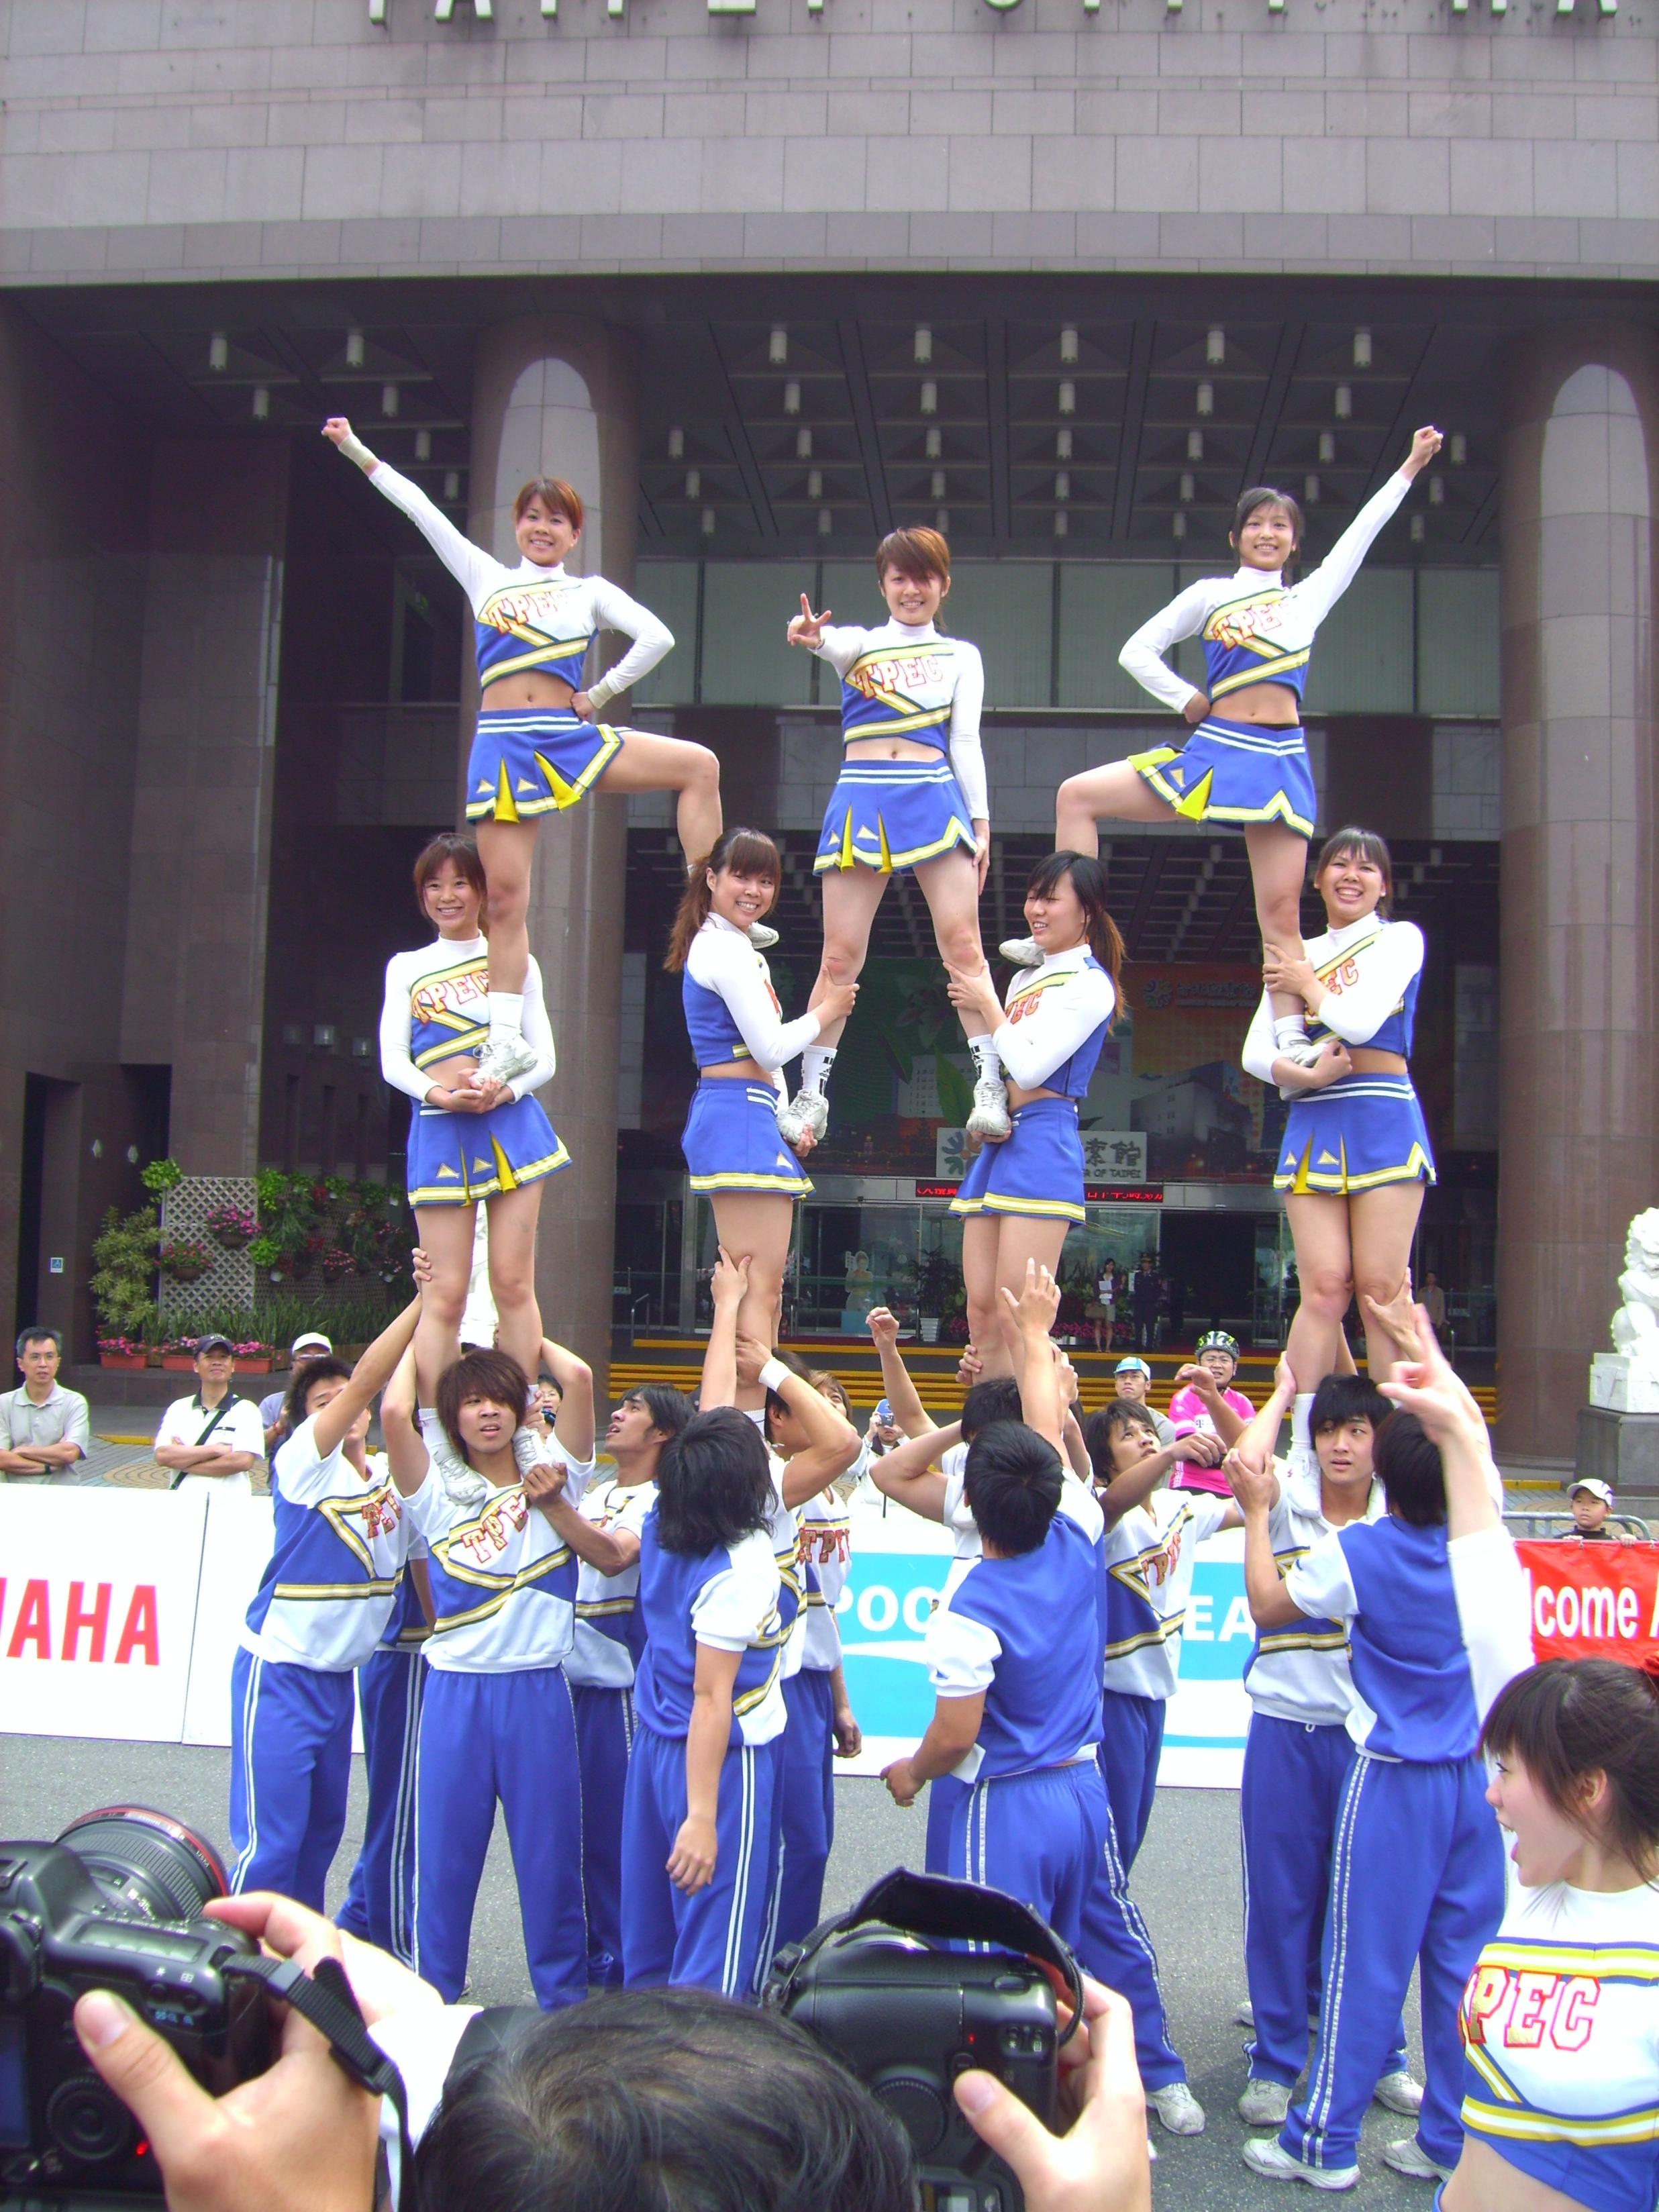 File:2007TourDeTaiwan7thStage-13.jpg - Wikimedia Commons